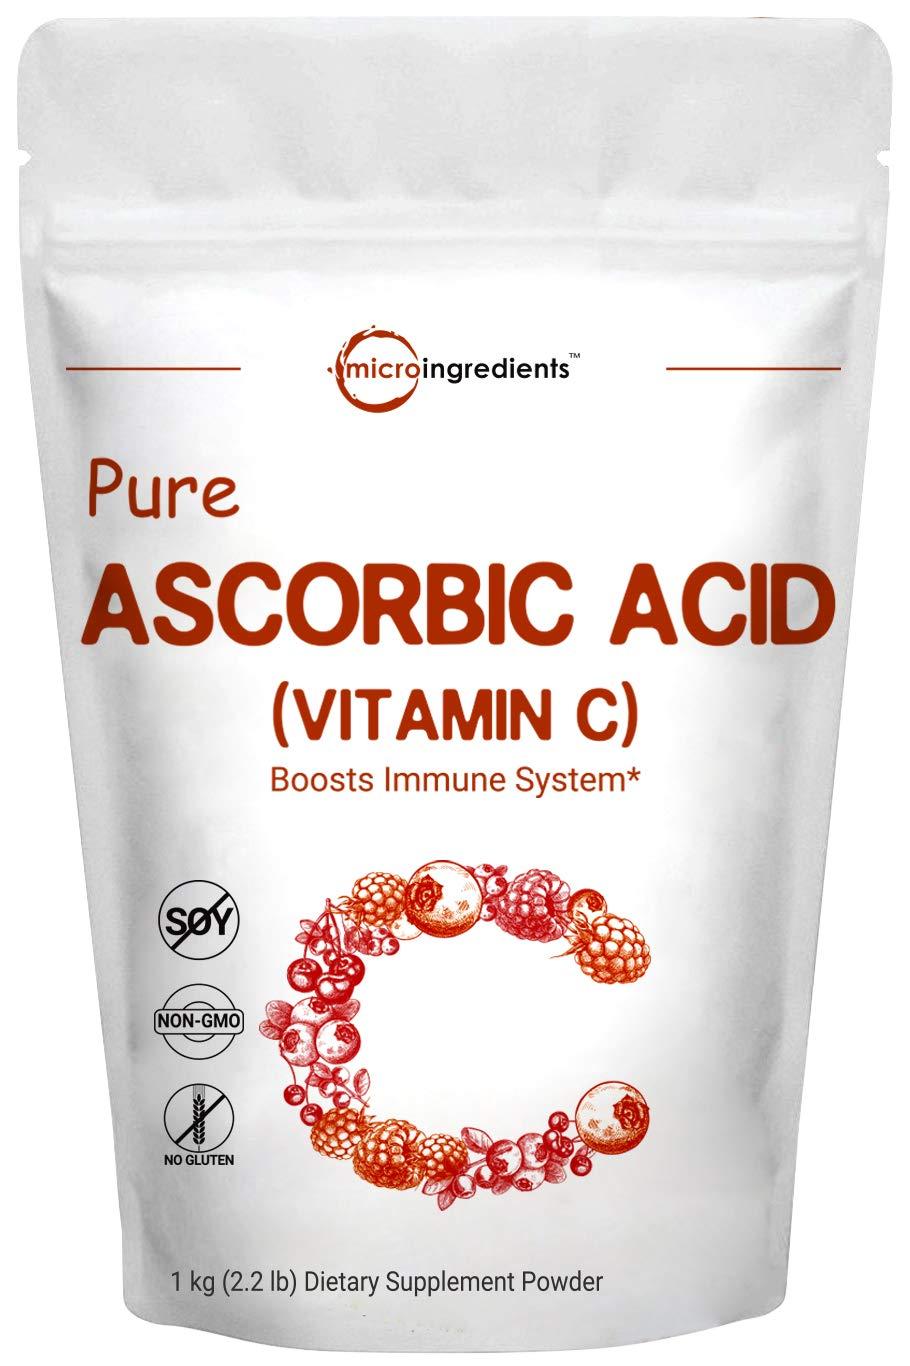 Pure Ascorbic Acid Powder (Vitamin C), 1 KG (2.2 Pounds), Antioxidant Powder for Making Serum or Adding to Smoothie, Pharmaceutical Grade, Non-GMO and Vegan Friendly